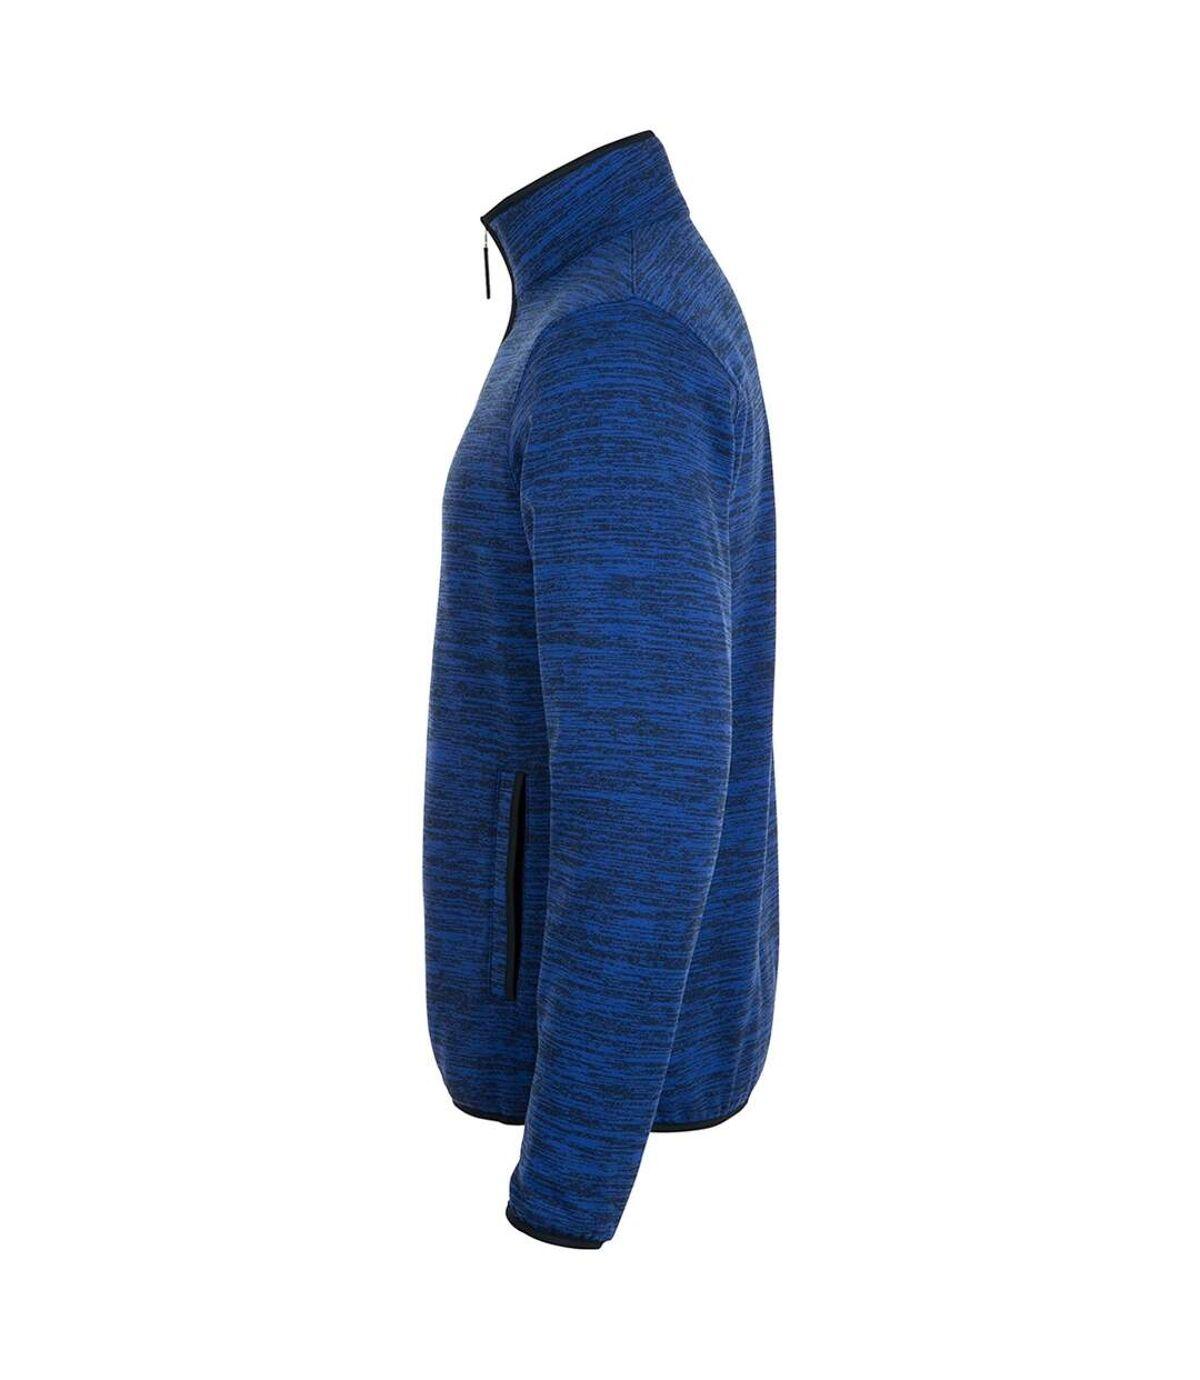 SOLS - Veste polaire TURBO - Homme (Bleu) - UTPC2744